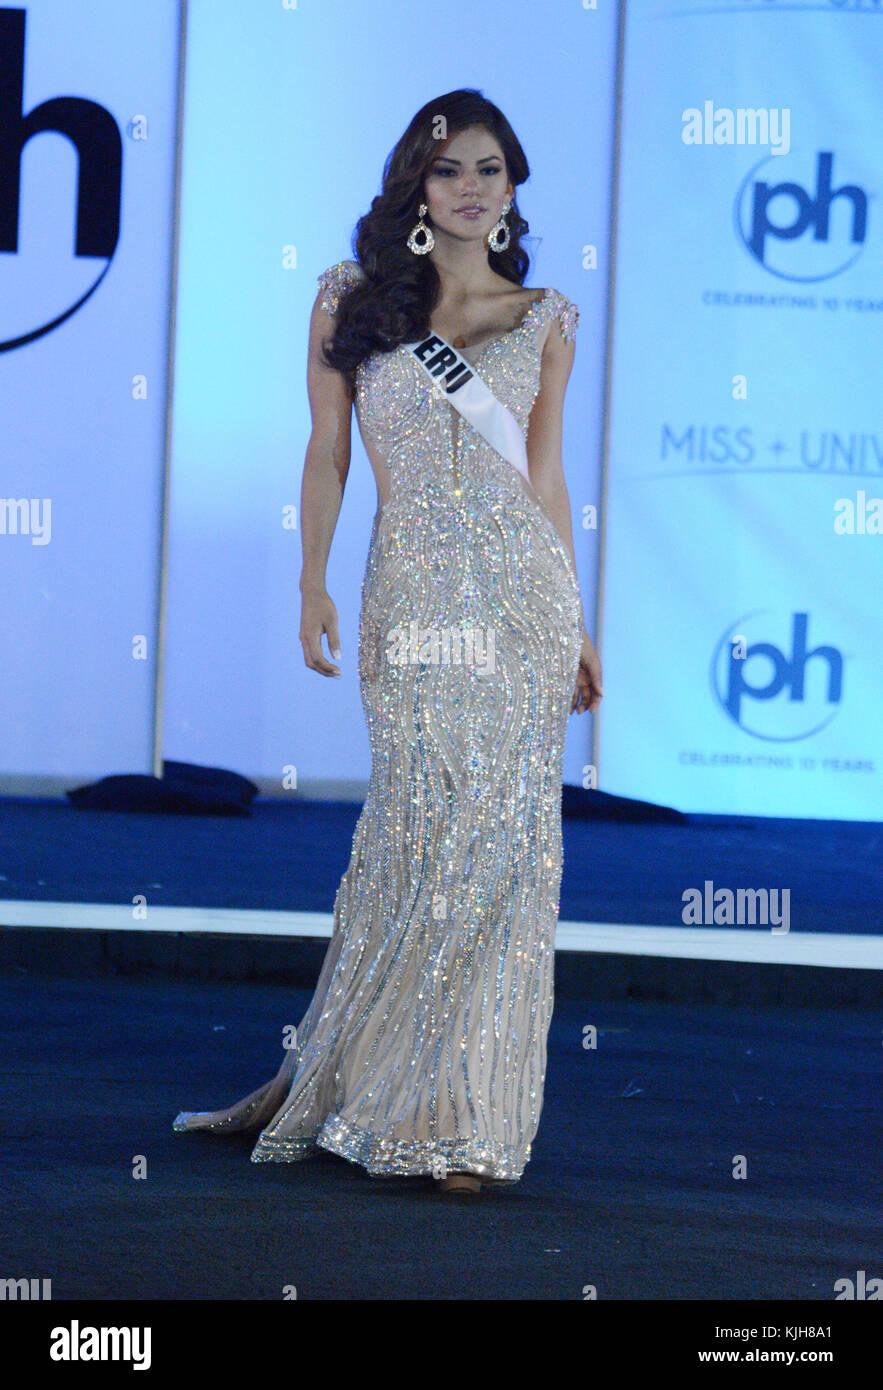 Las Vegas, Nevada, USA. 24th Nov, 2017. Miss Universe Peru Prissila ...